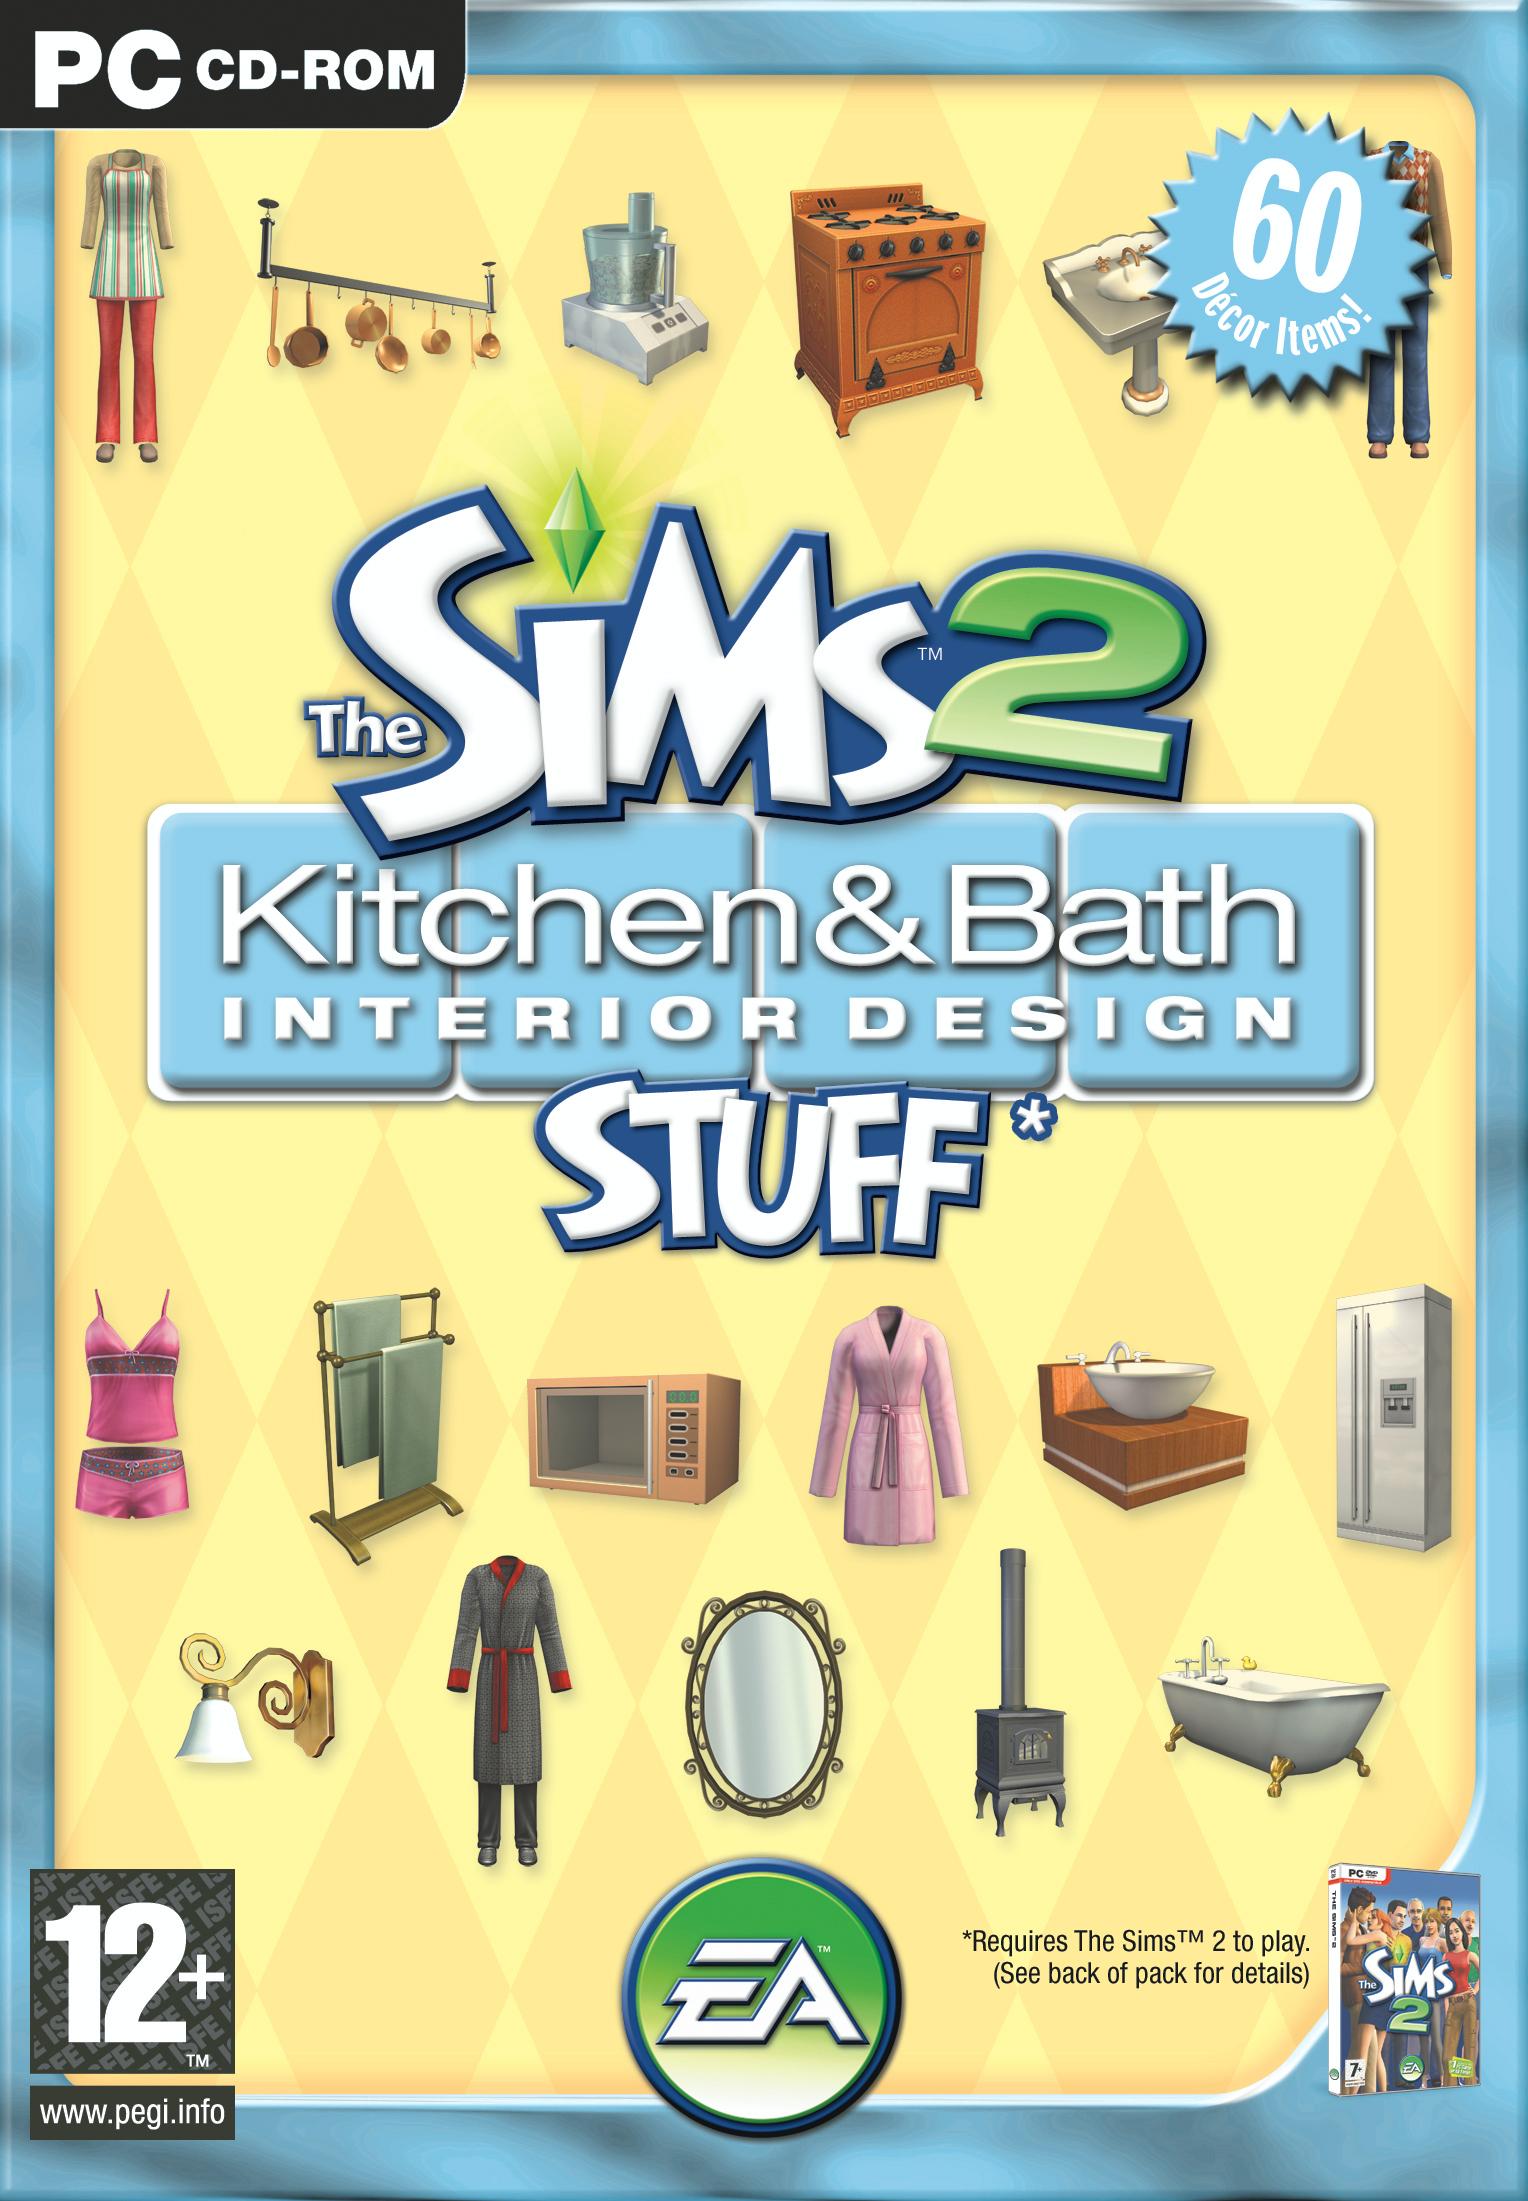 Sims 3 Design Garten Accessoires Neu the Sims 2 Kitchen & Bath Interior Design Stuff